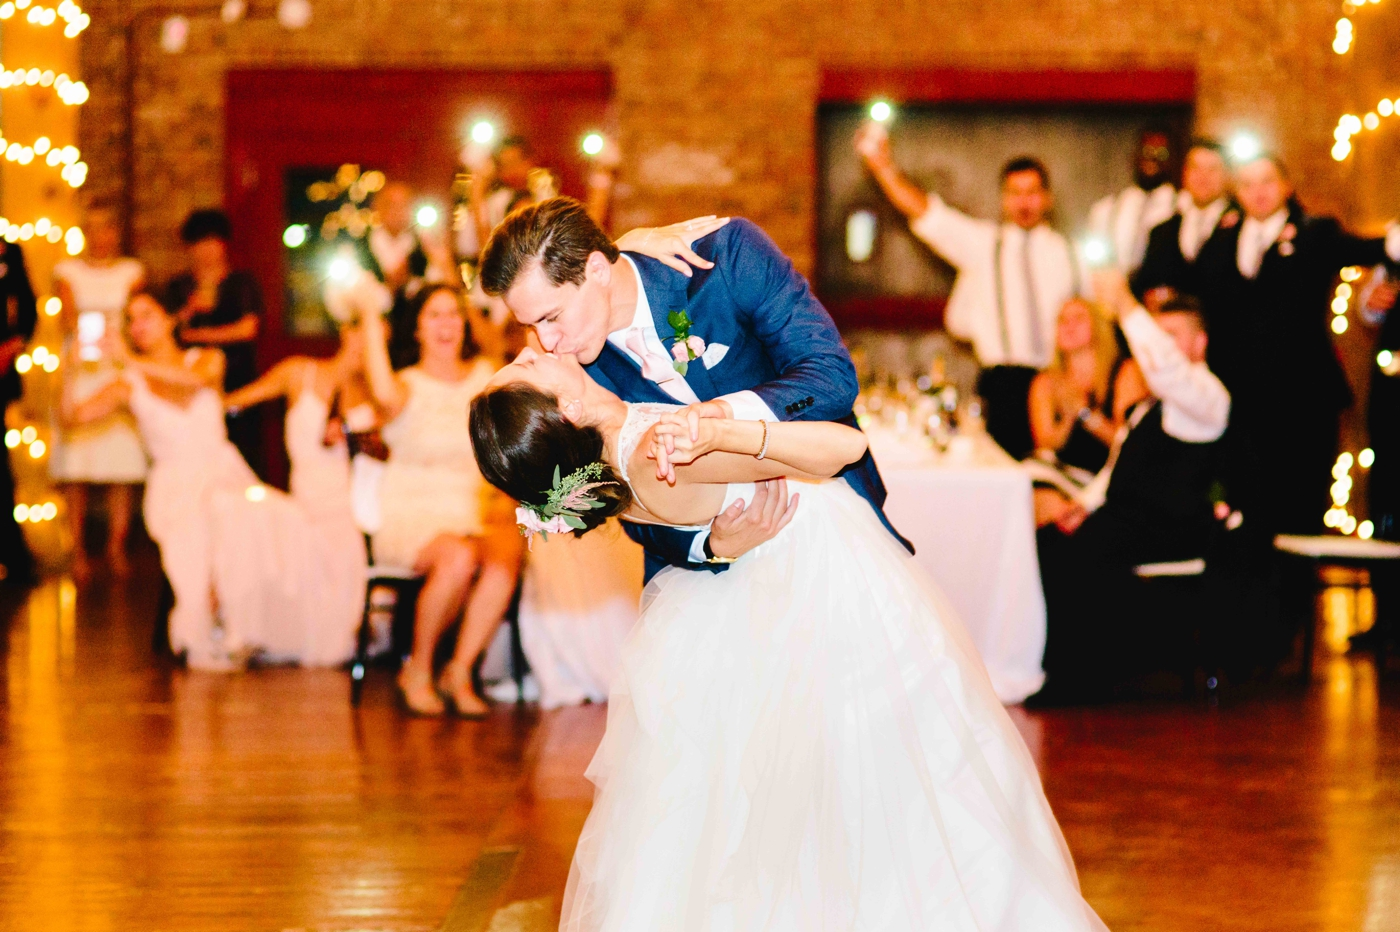 chicago-fine-art-wedding-photography-tyma58